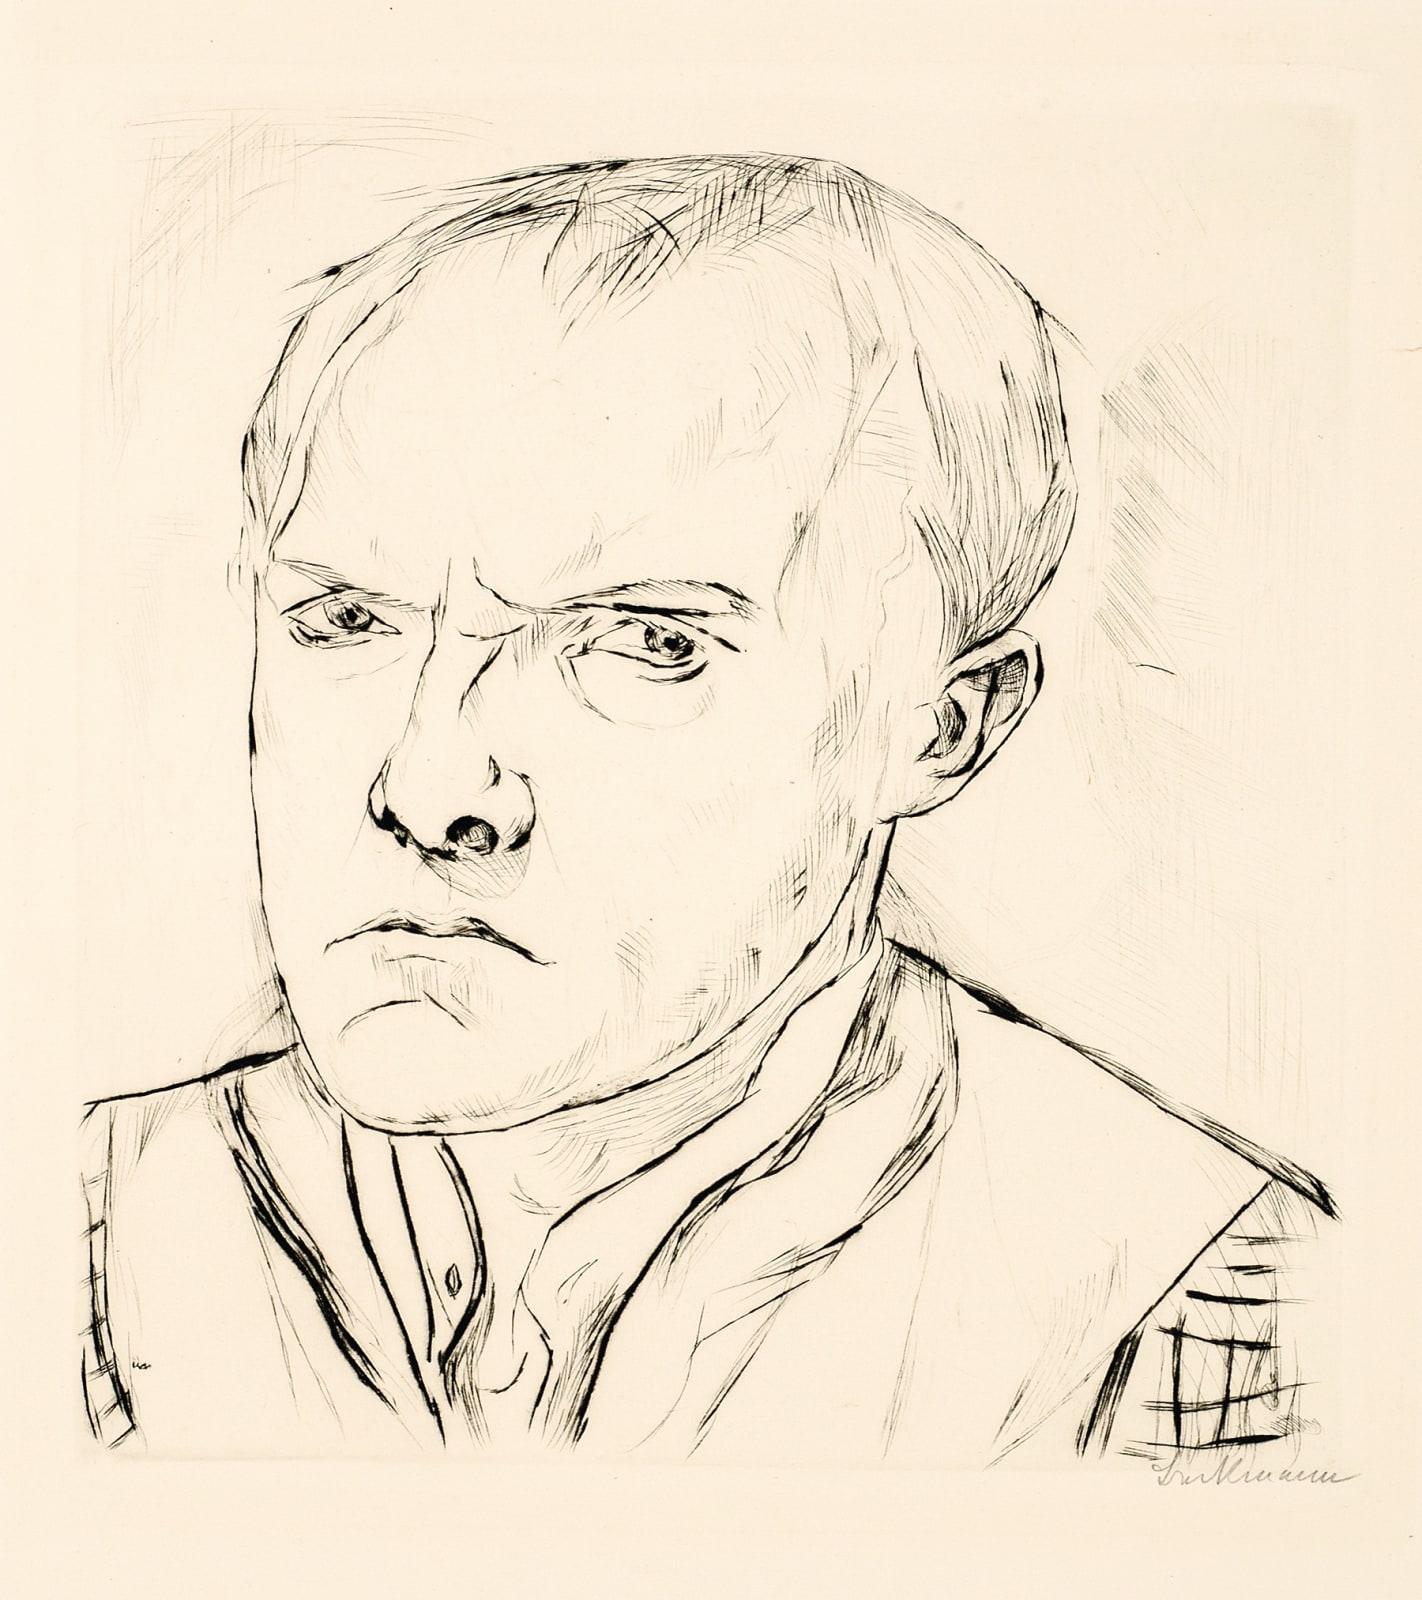 Max Beckmann Silbsbildnis (Self-Portrait), 1918